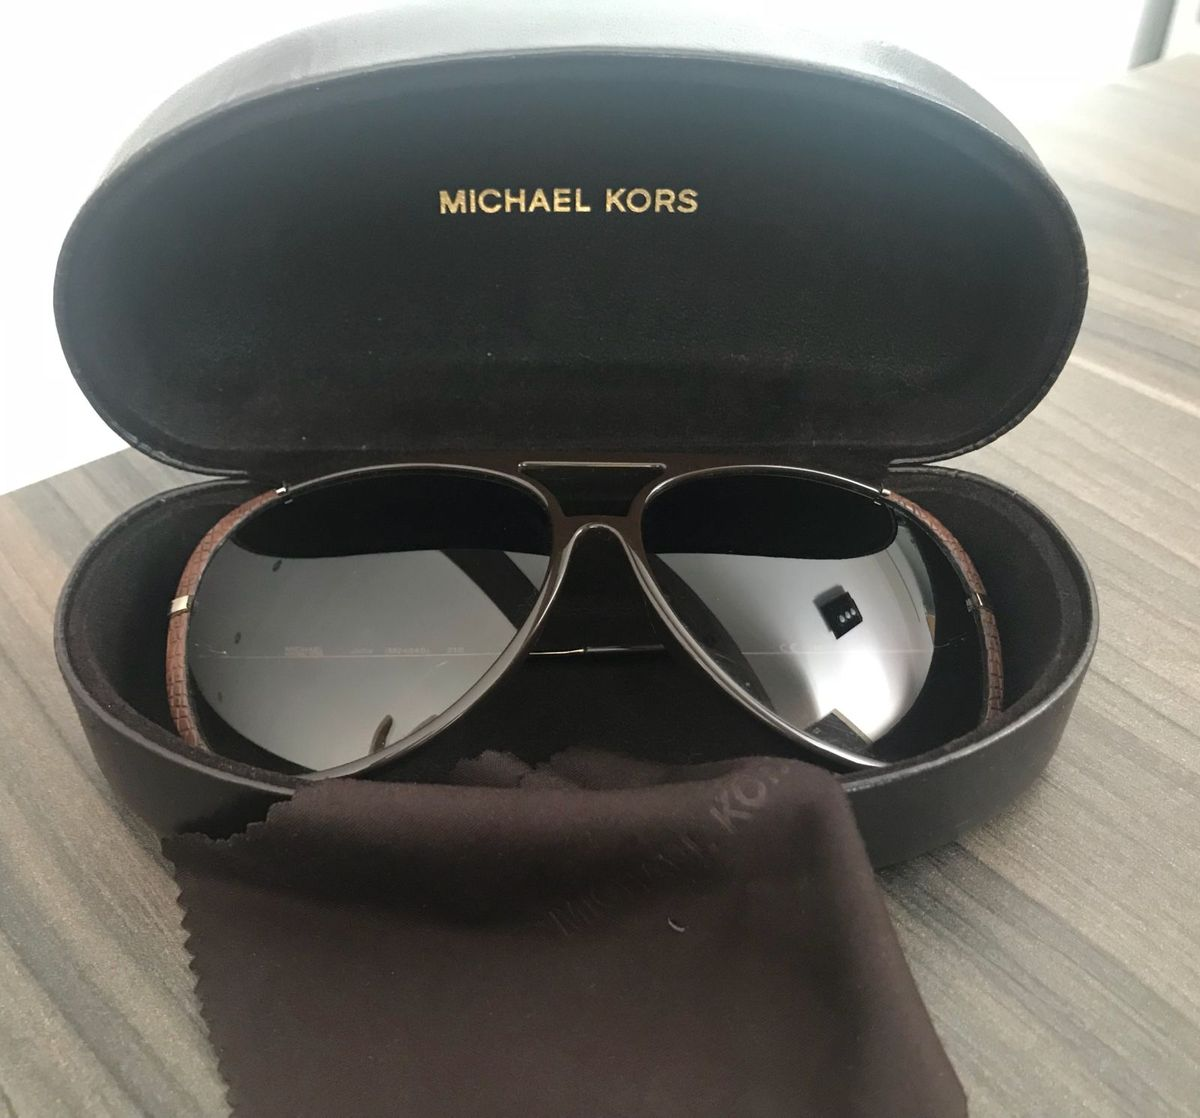 c96d46b977af8 óculos de sol michael kors - óculos michael kors.  Czm6ly9wag90b3muzw5qb2vplmnvbs5ici9wcm9kdwn0cy82mdgxode0l2e1zjq0mjjkzdgynjg1yzmwmjkyyzy4ogrjmgq1ogvmlmpwzw  ...